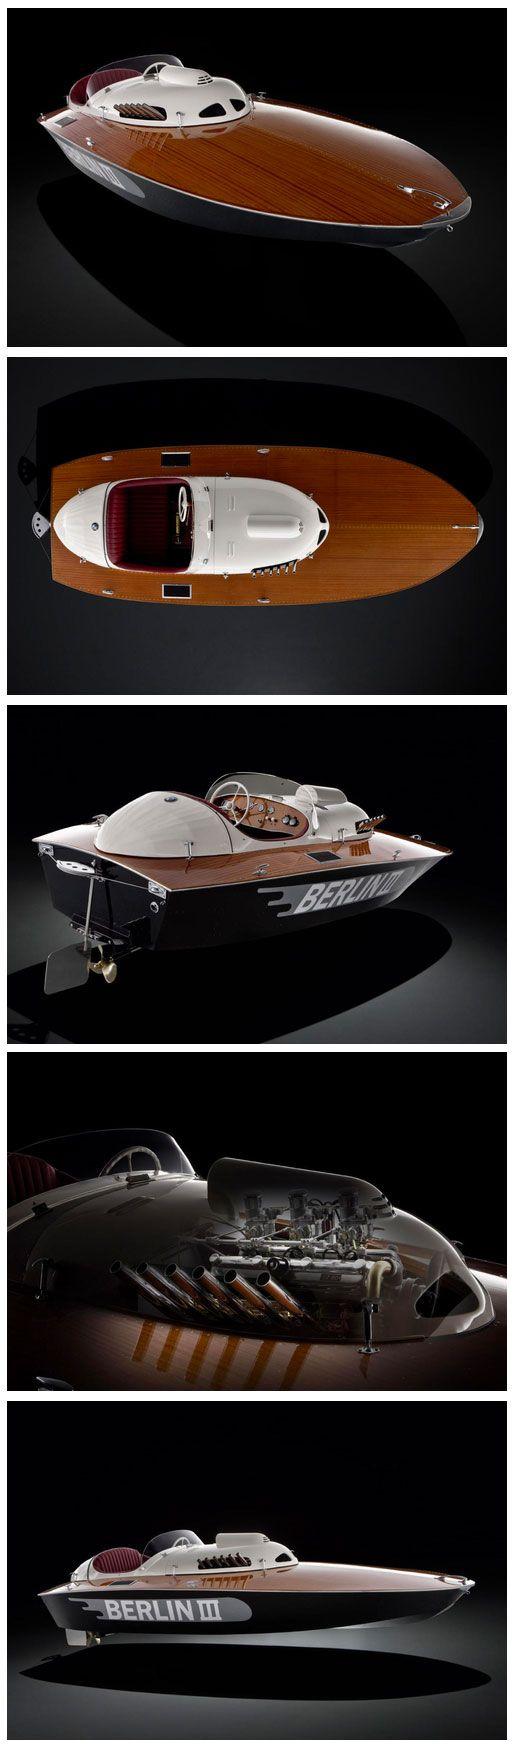 1950 'Berlin lll' E2 Class Racing Sports Boat